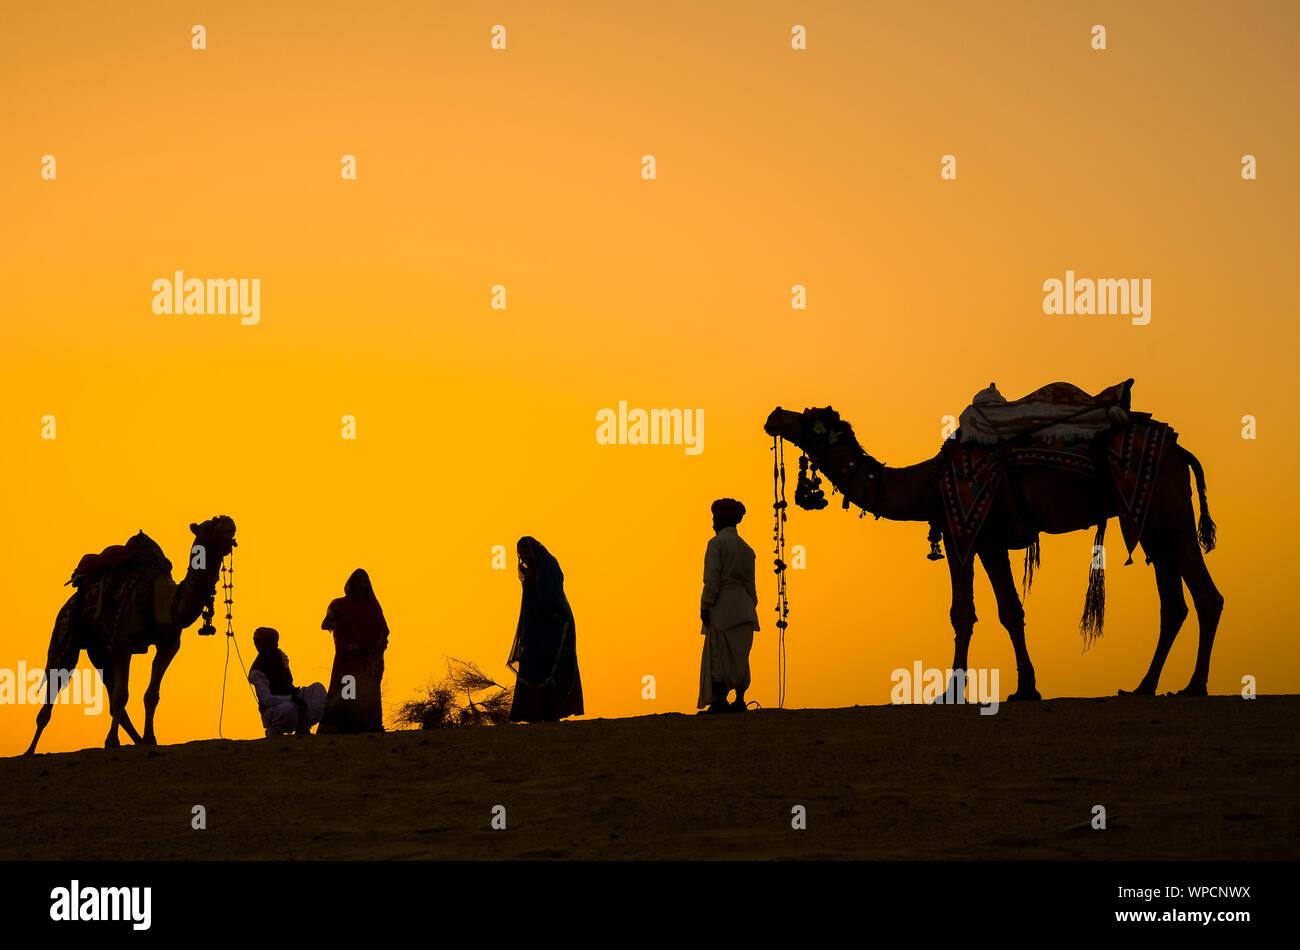 Jaisalmer, Rajasthan, India - abril 18th, 2018: indian cameleers (conductores de camello) con siluetas de camellos en las dunas del desierto de Thar en Sunset. Foto de stock